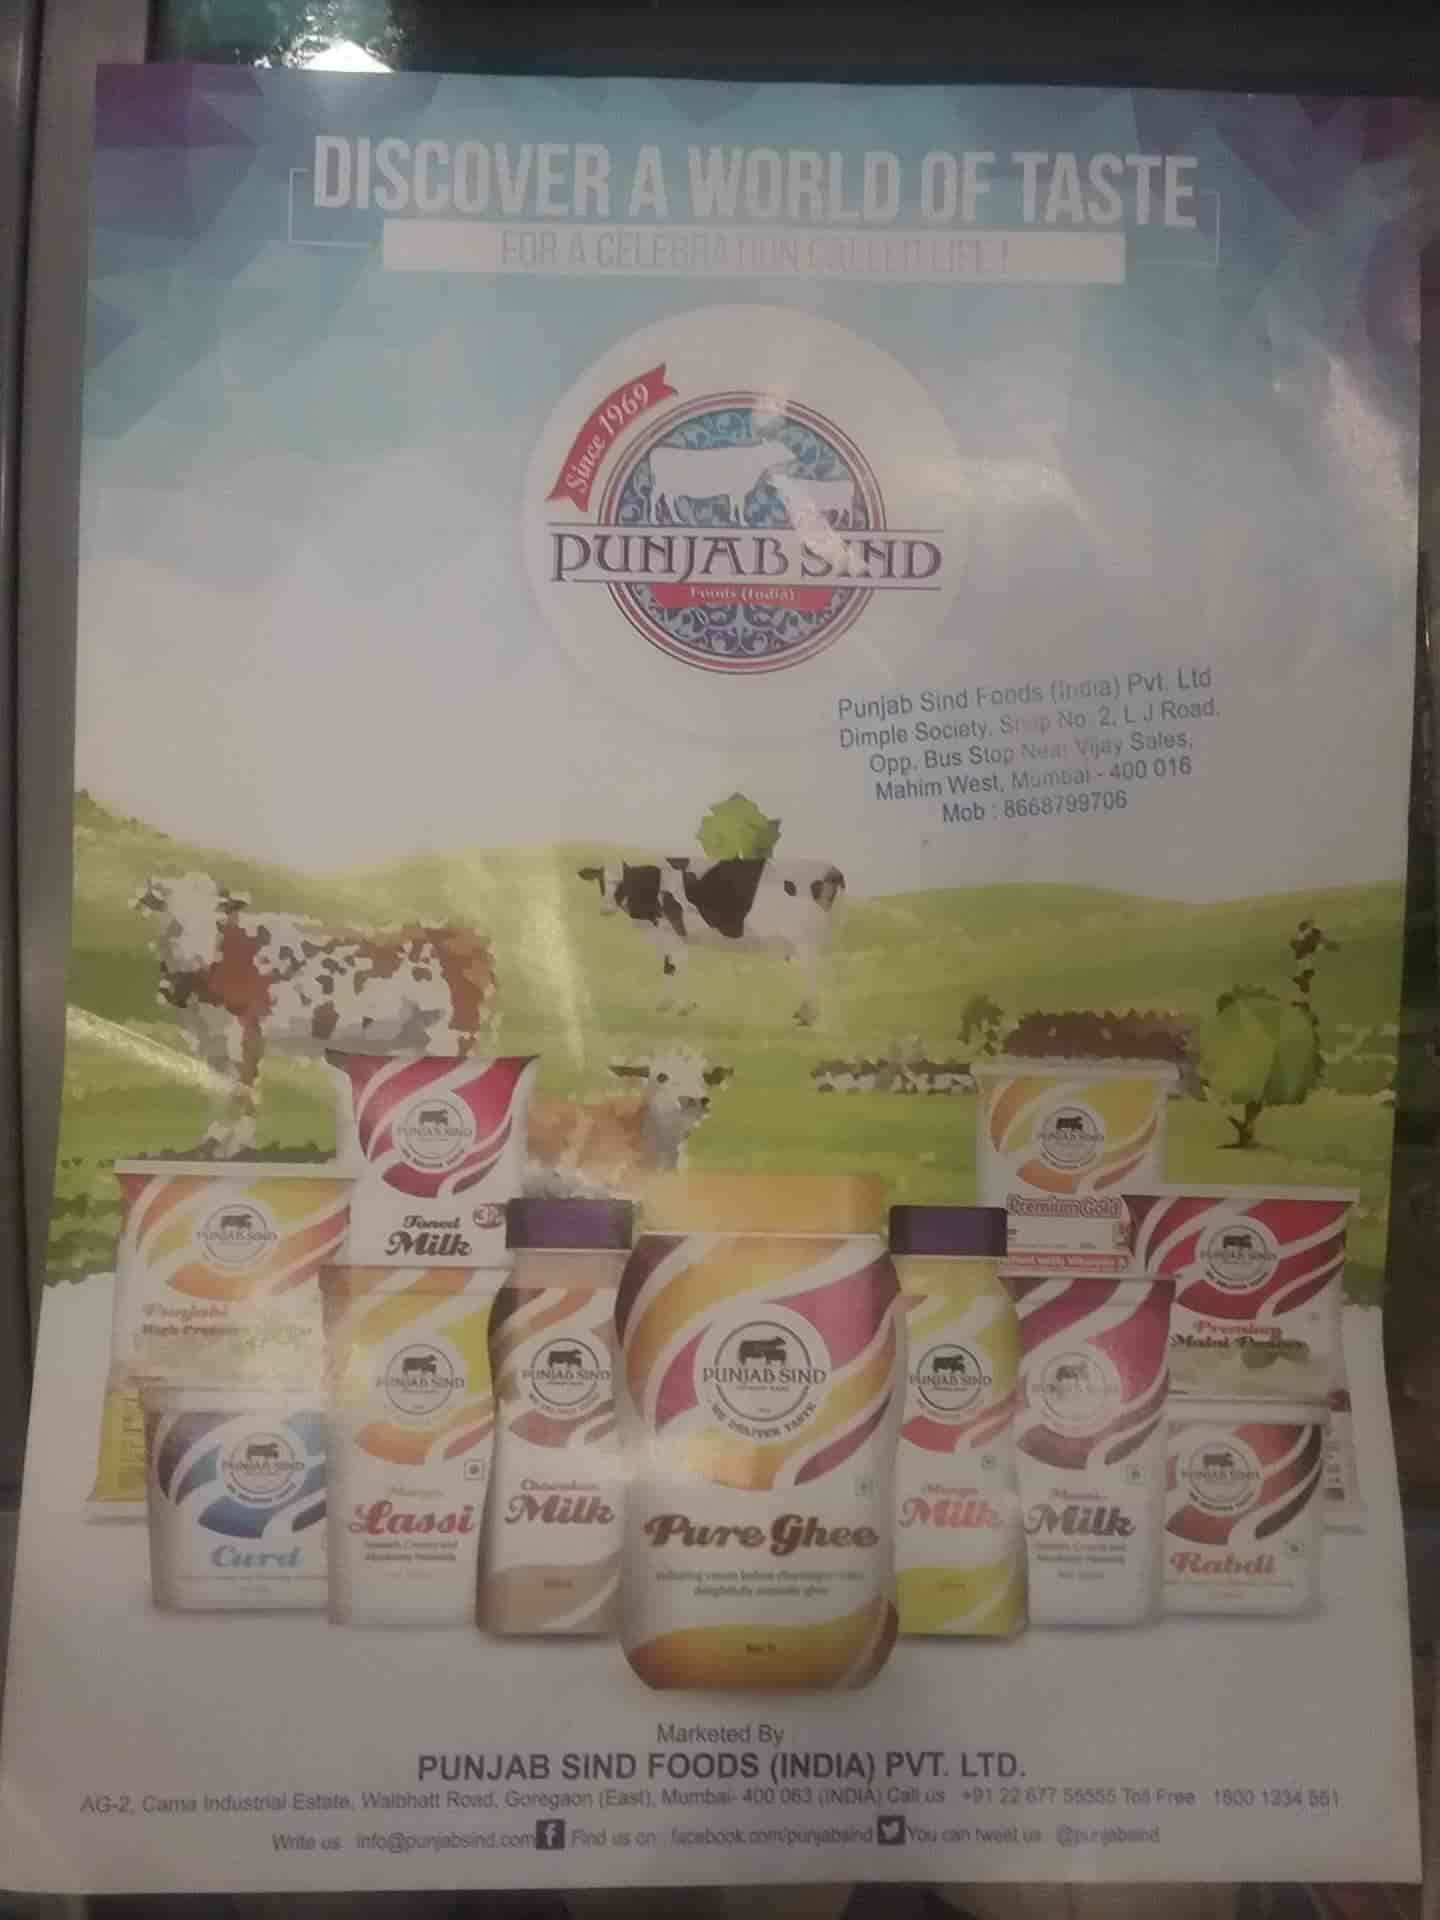 Punjab Sind Foods India Pvt Ltd, Mahim, Mumbai - Sweet Shops - Justdial